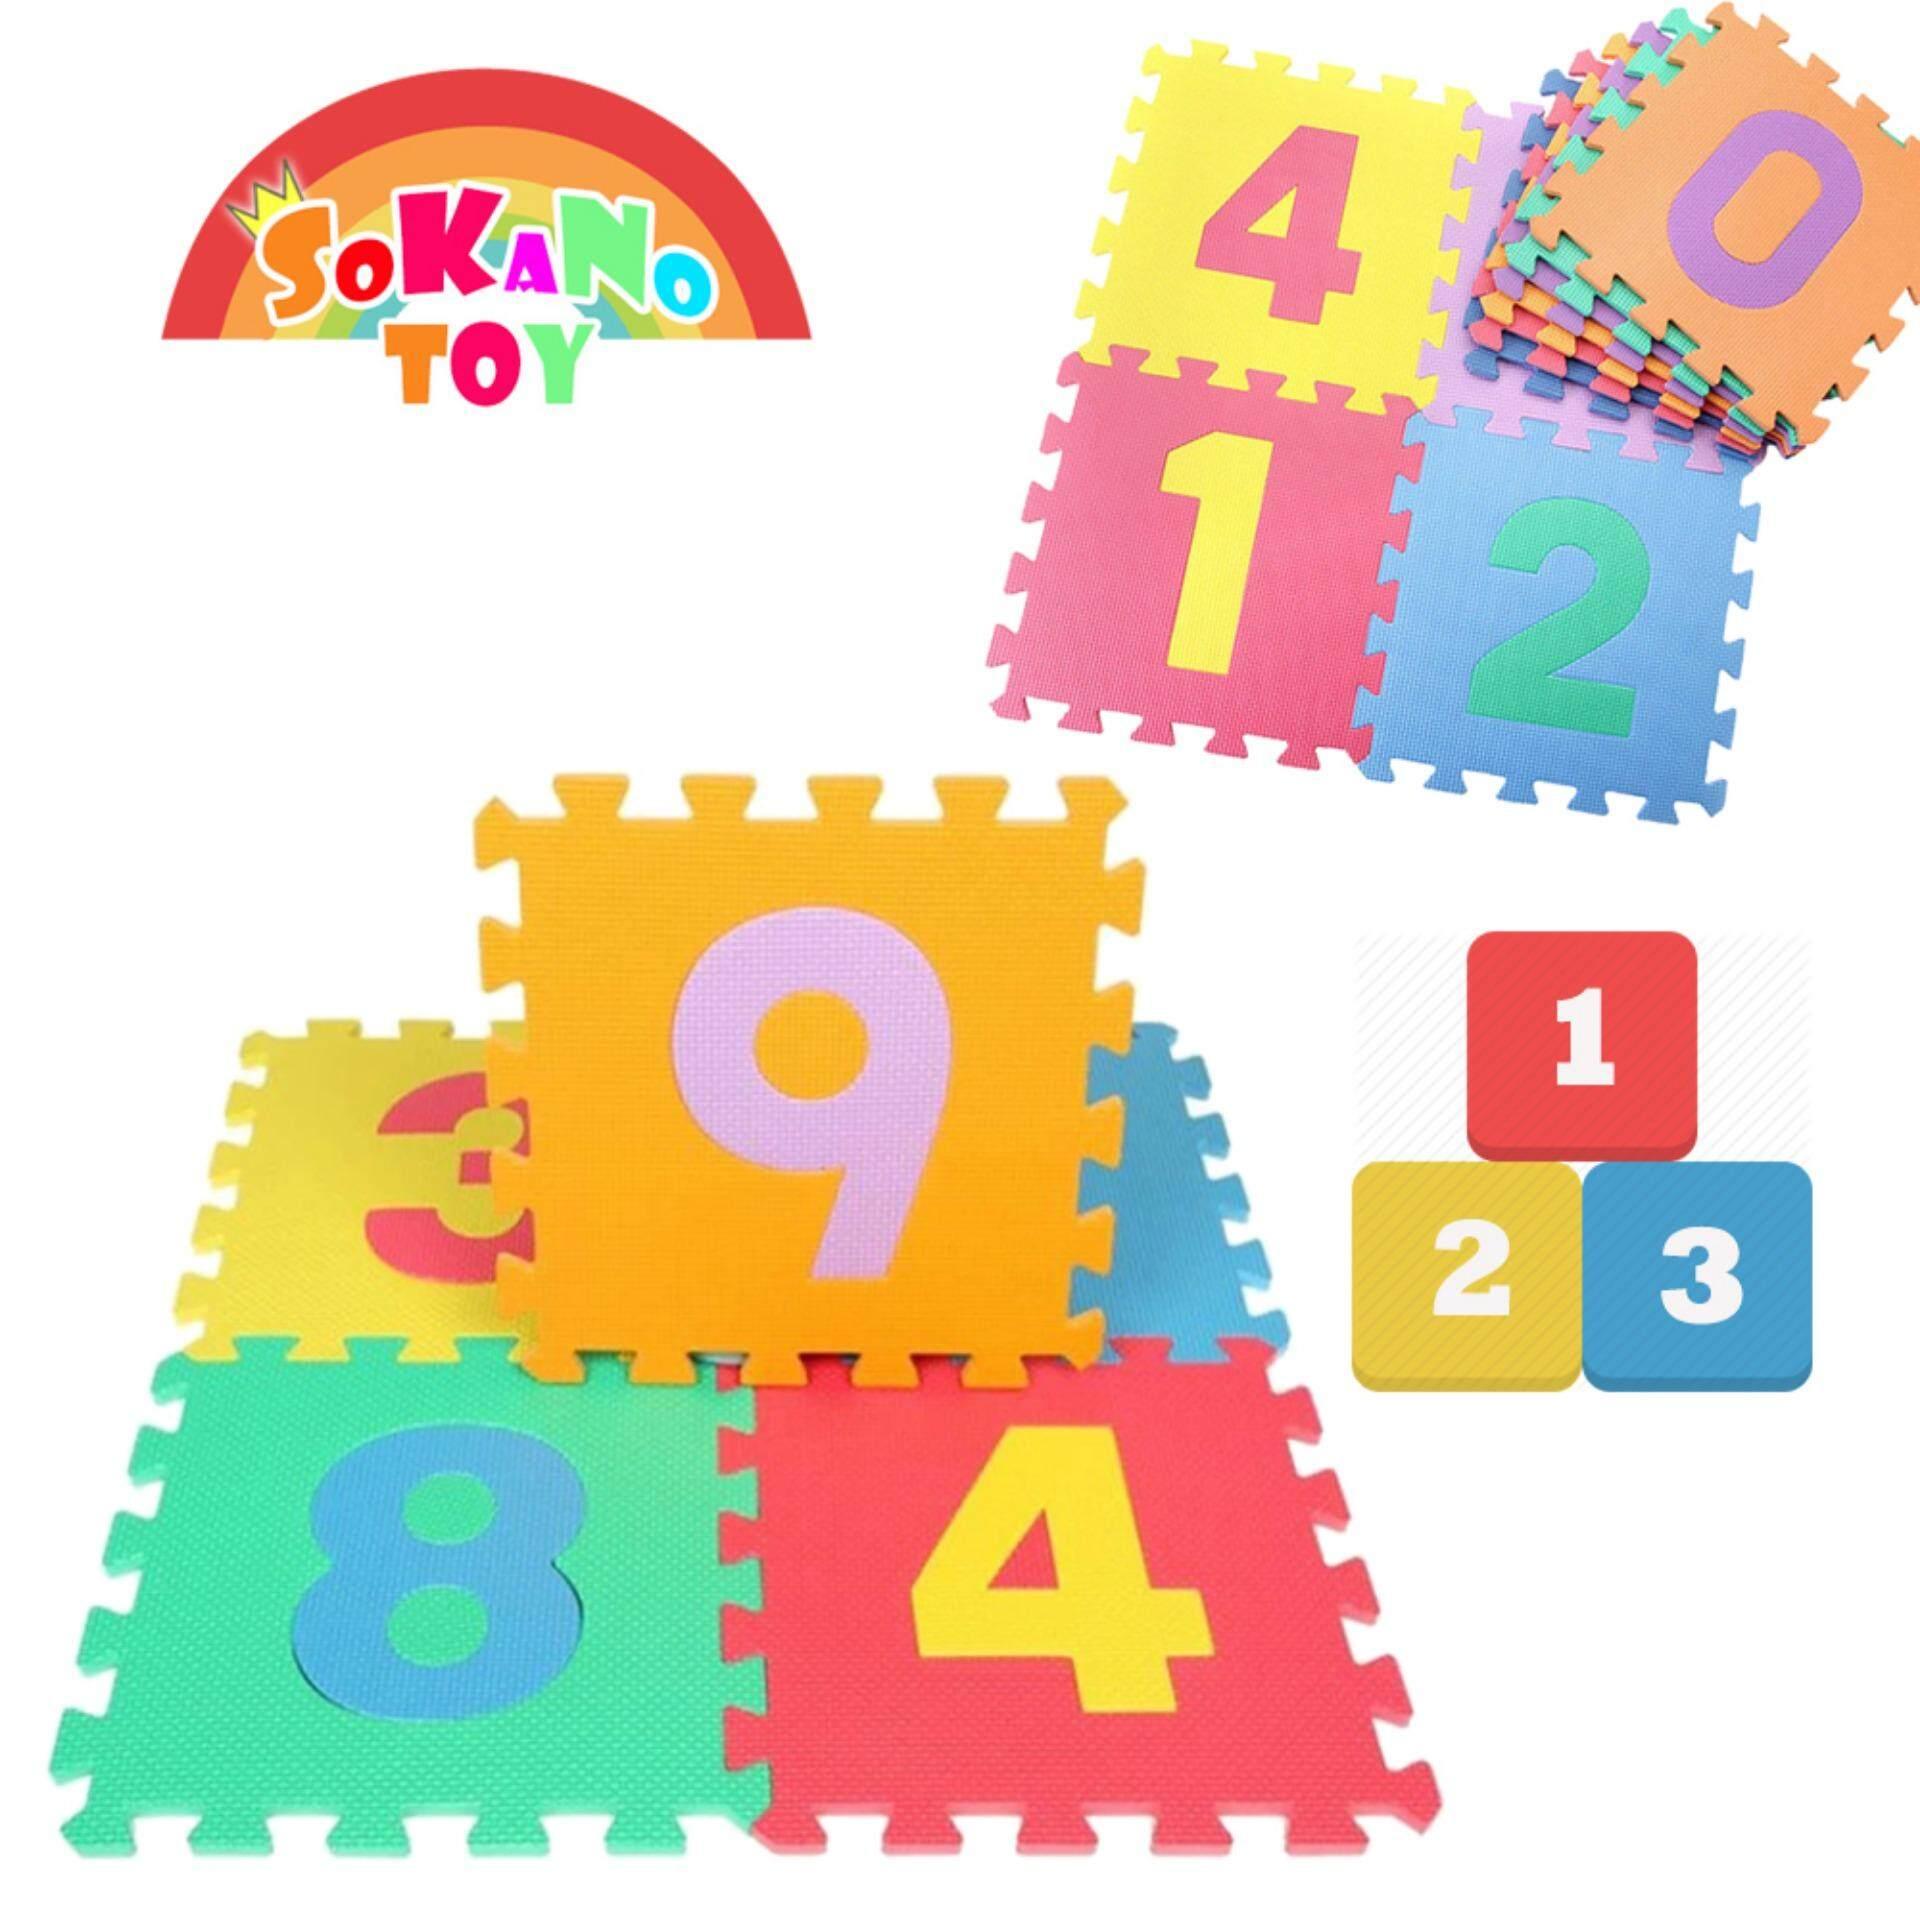 SOKANO TOY 29cm x 29cm EVA Foam Kid and baby Crawling Puzzle Play Mat- Number Design (10 Pcs)